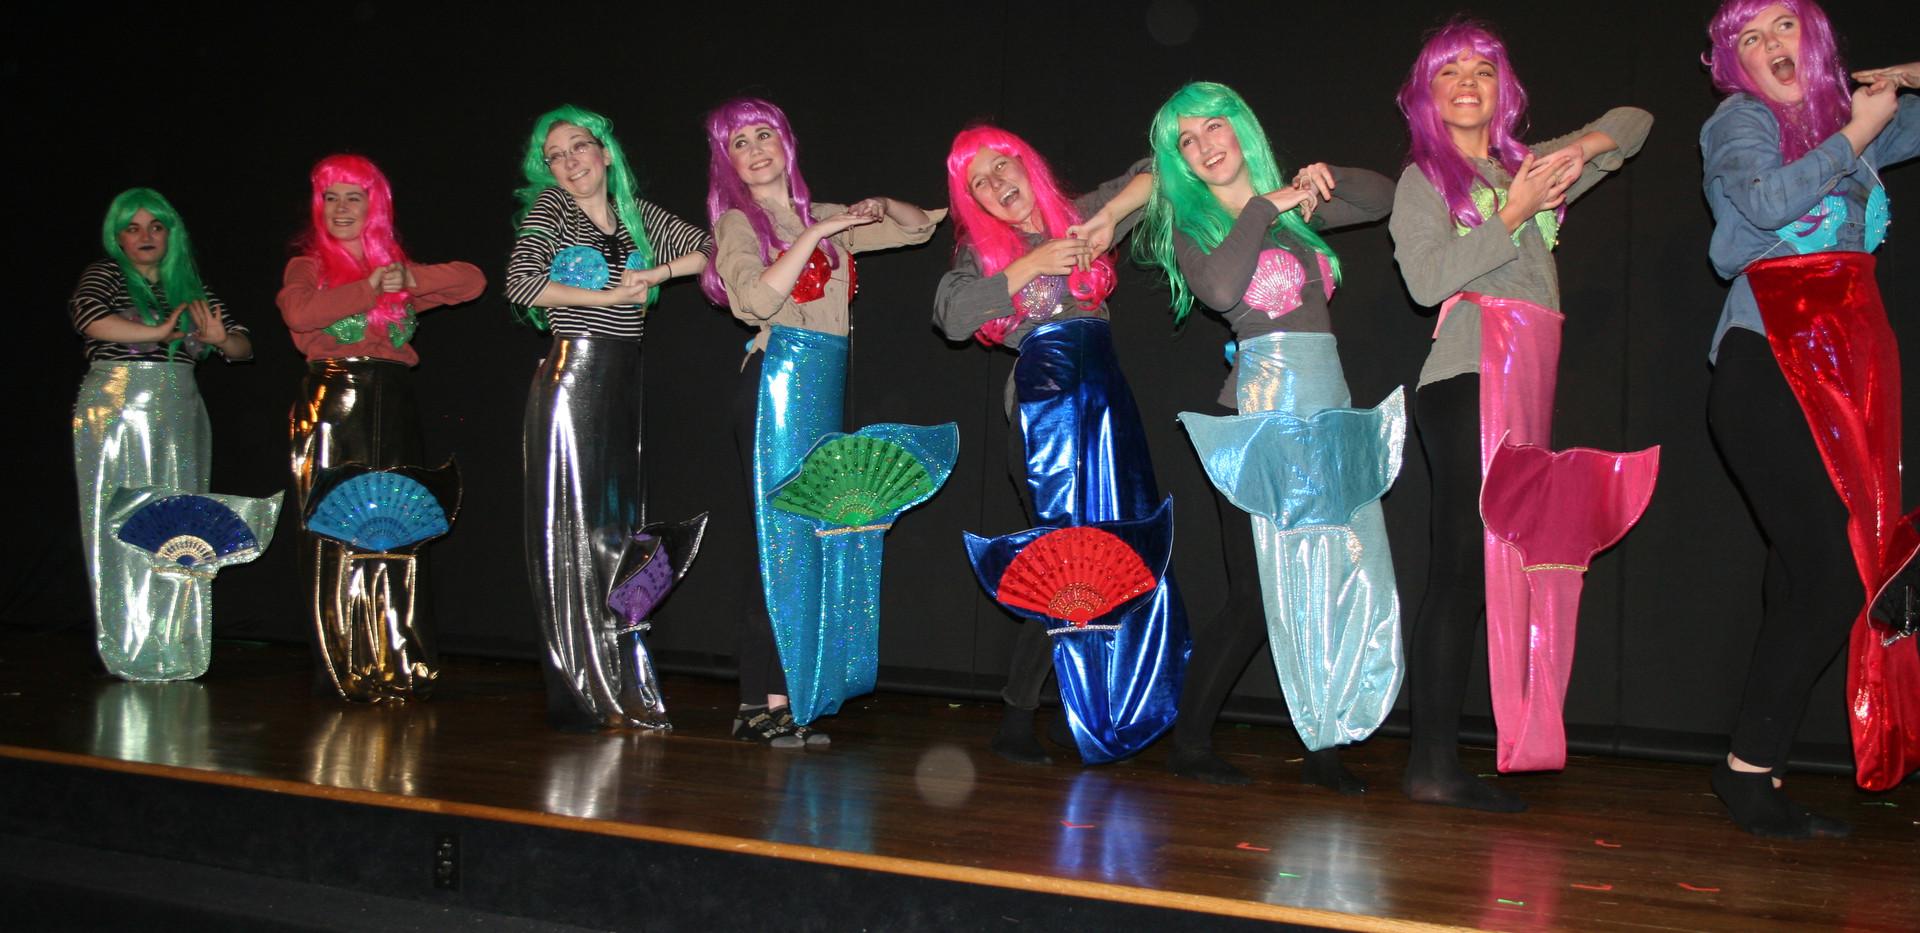 Peter and the Starcatcher - Mermaids